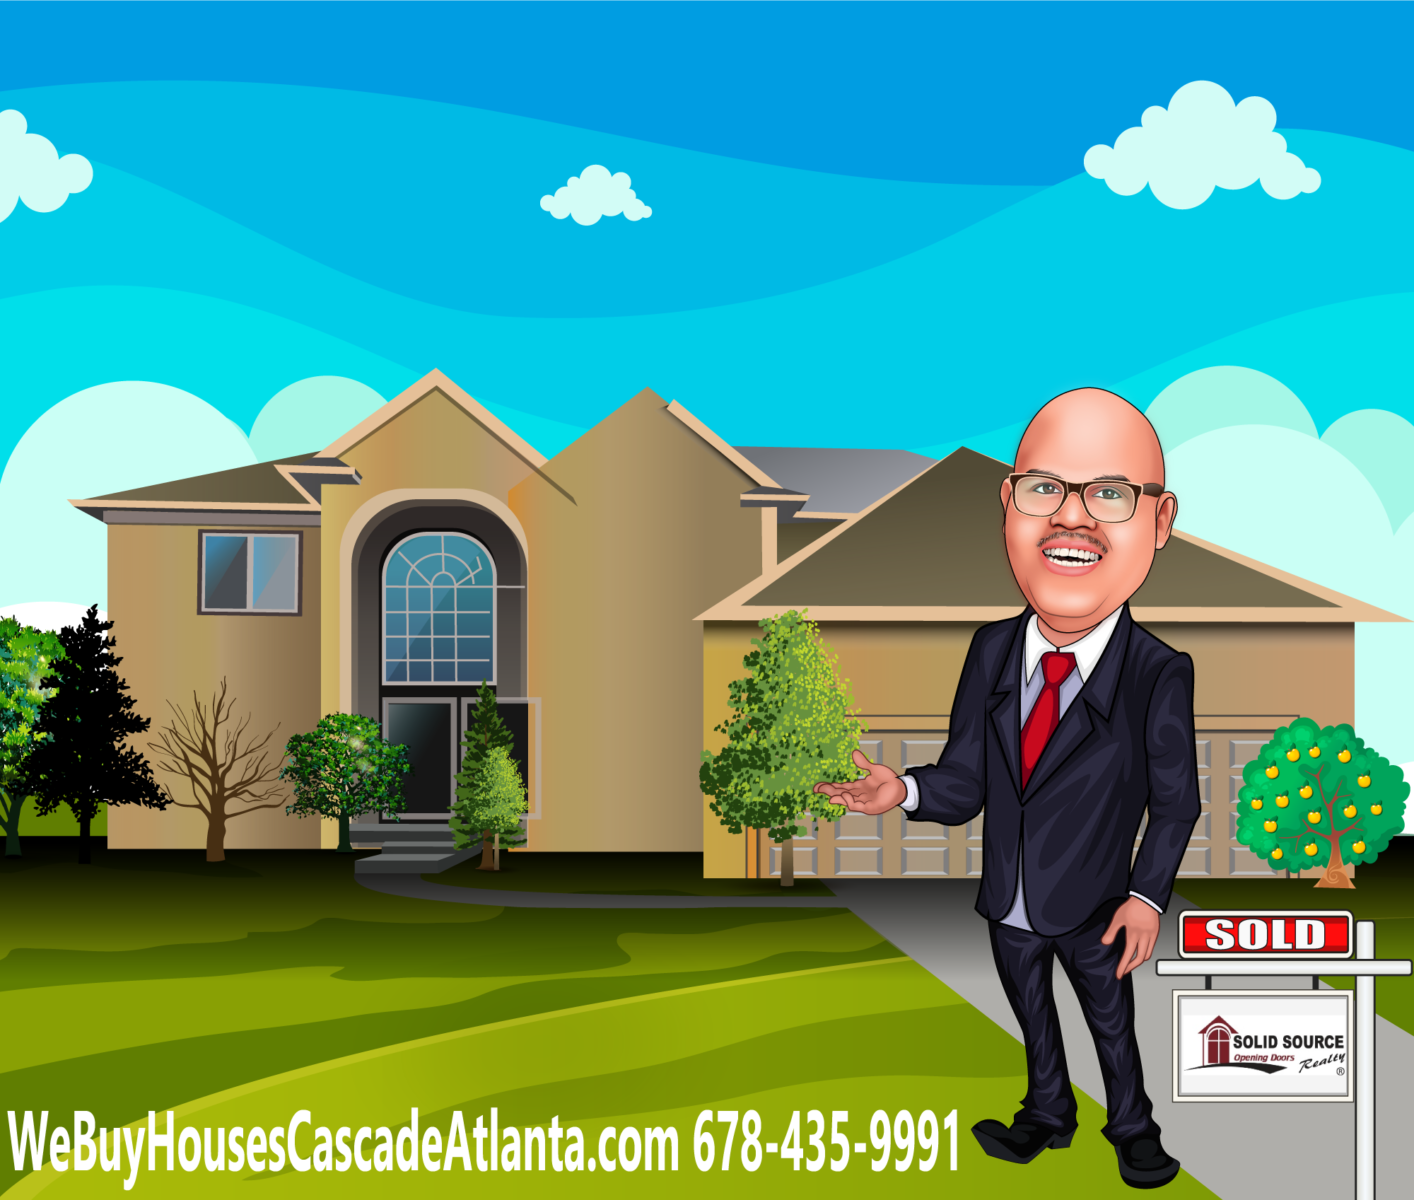 We Buy Houses Cascade Atlanta 30310, 30311, 30318 logo